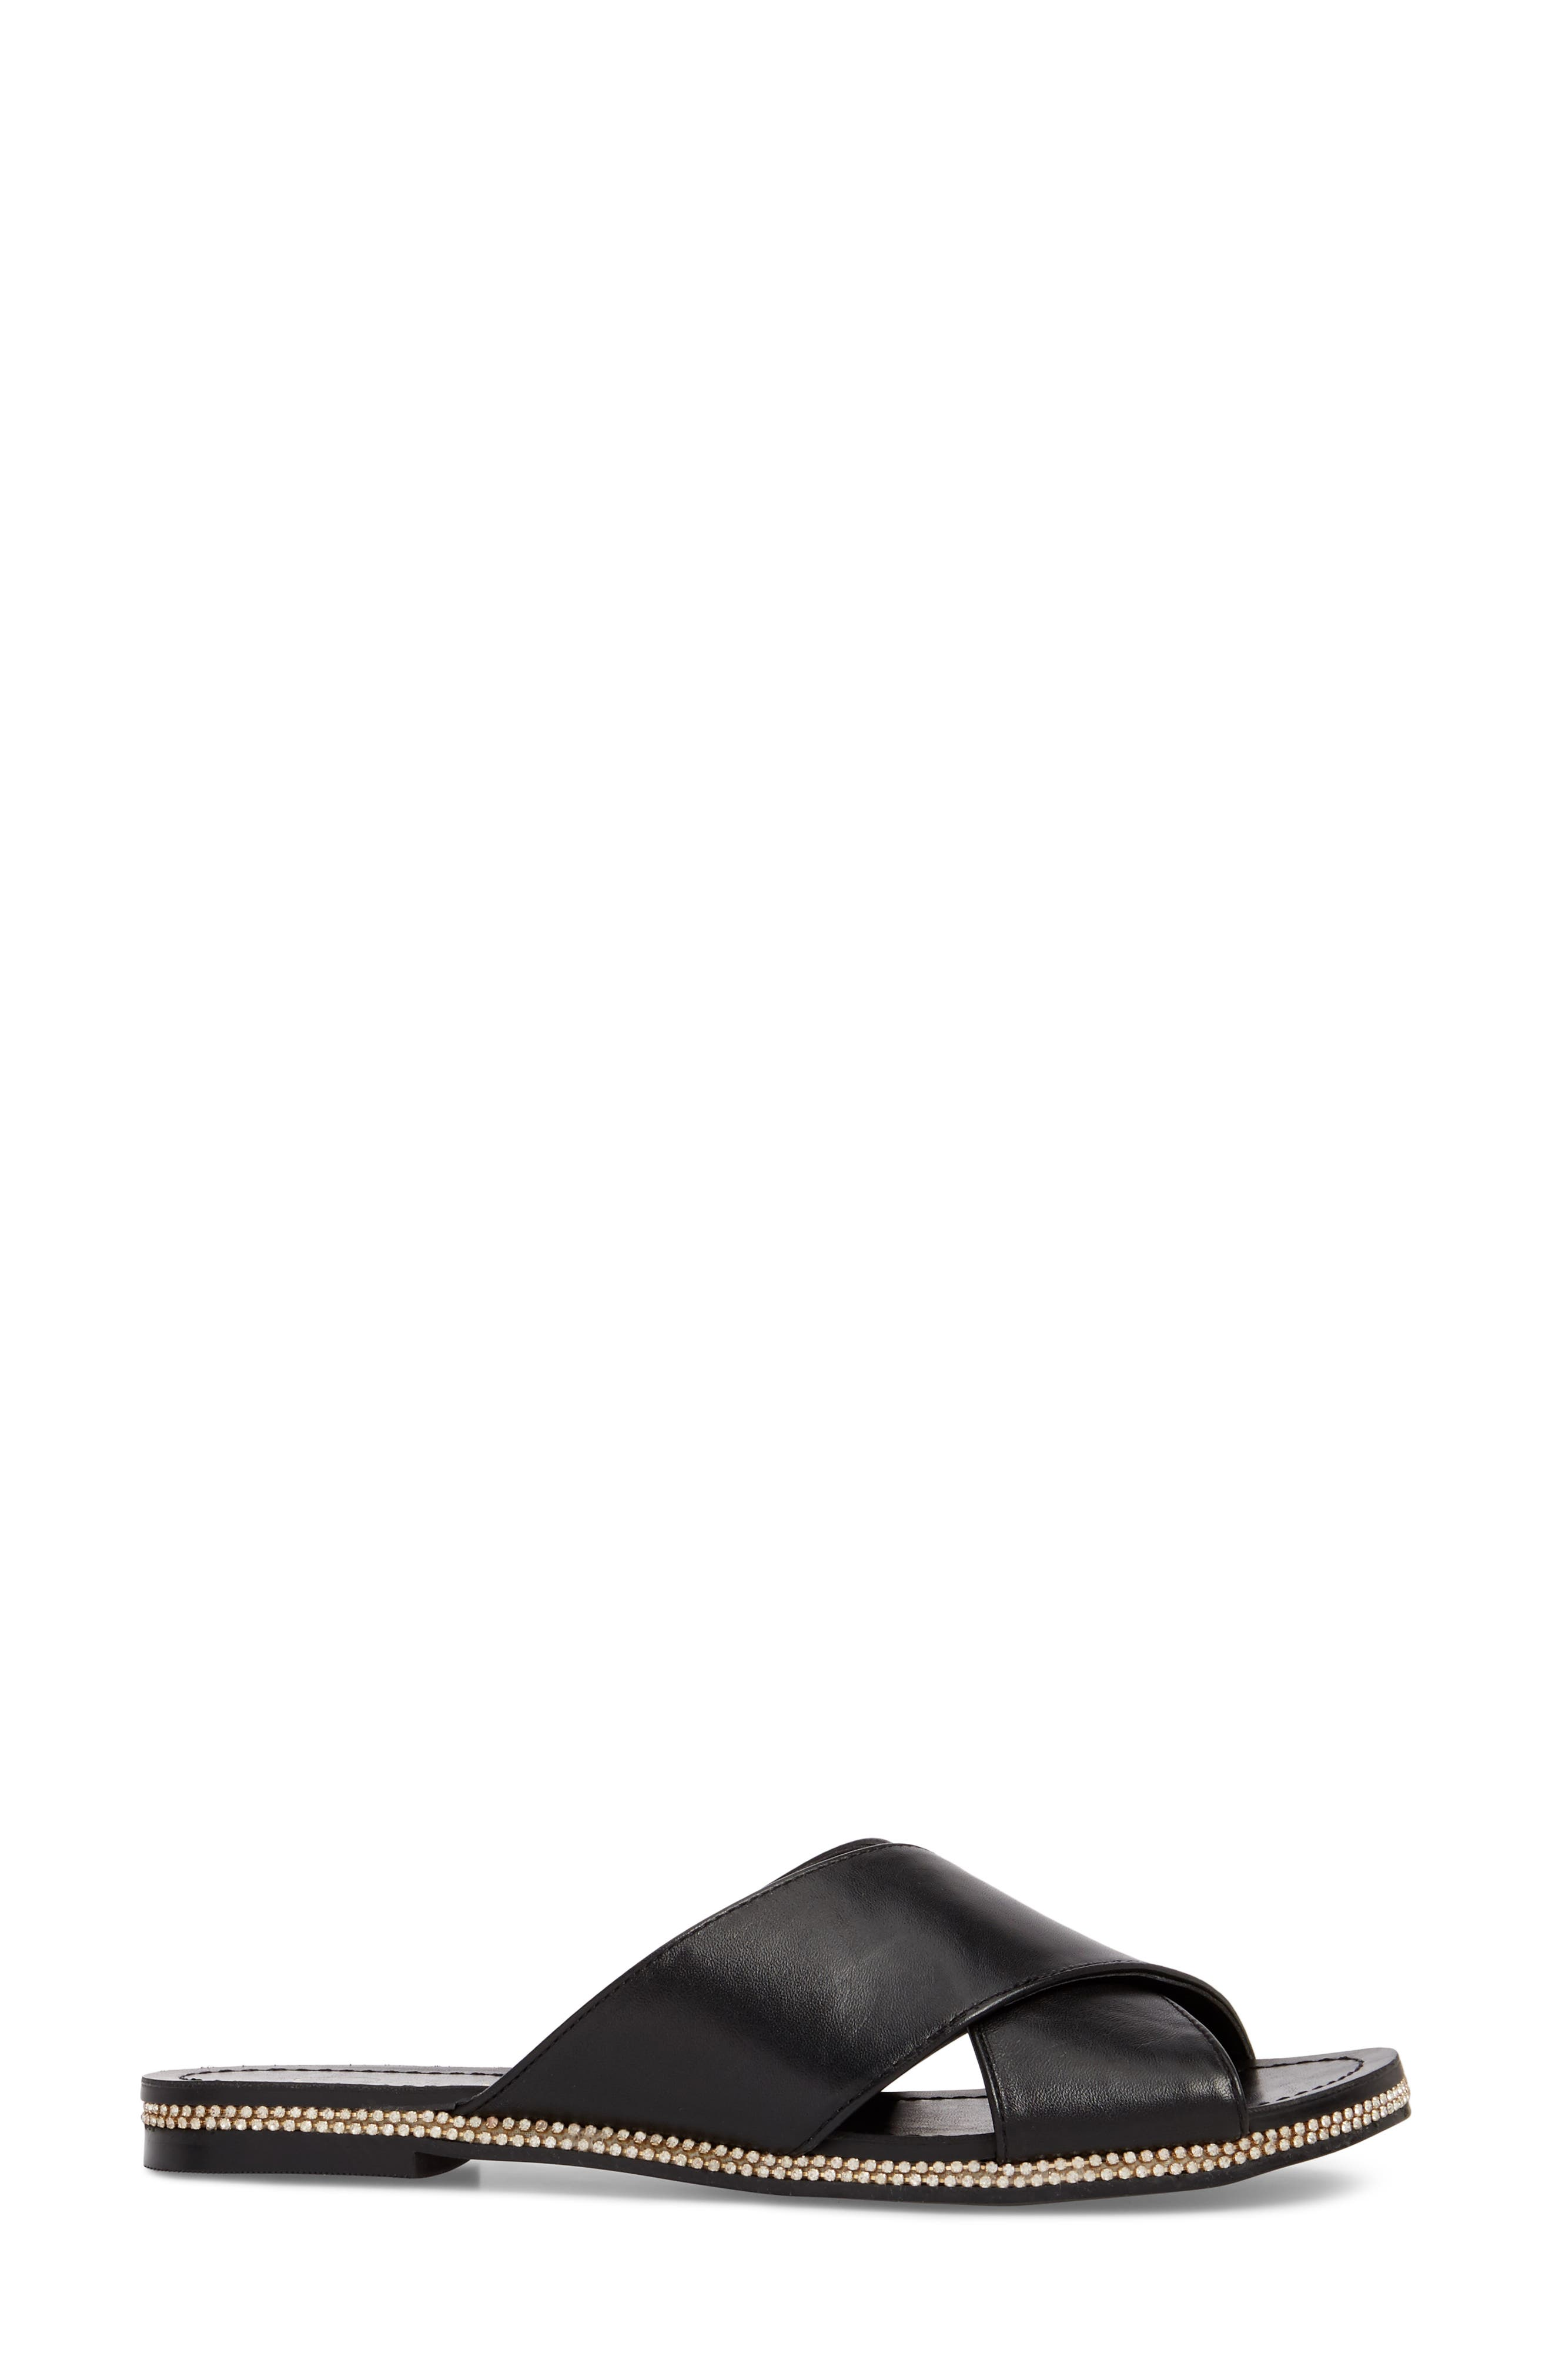 Brinella Sandal,                             Alternate thumbnail 3, color,                             Black